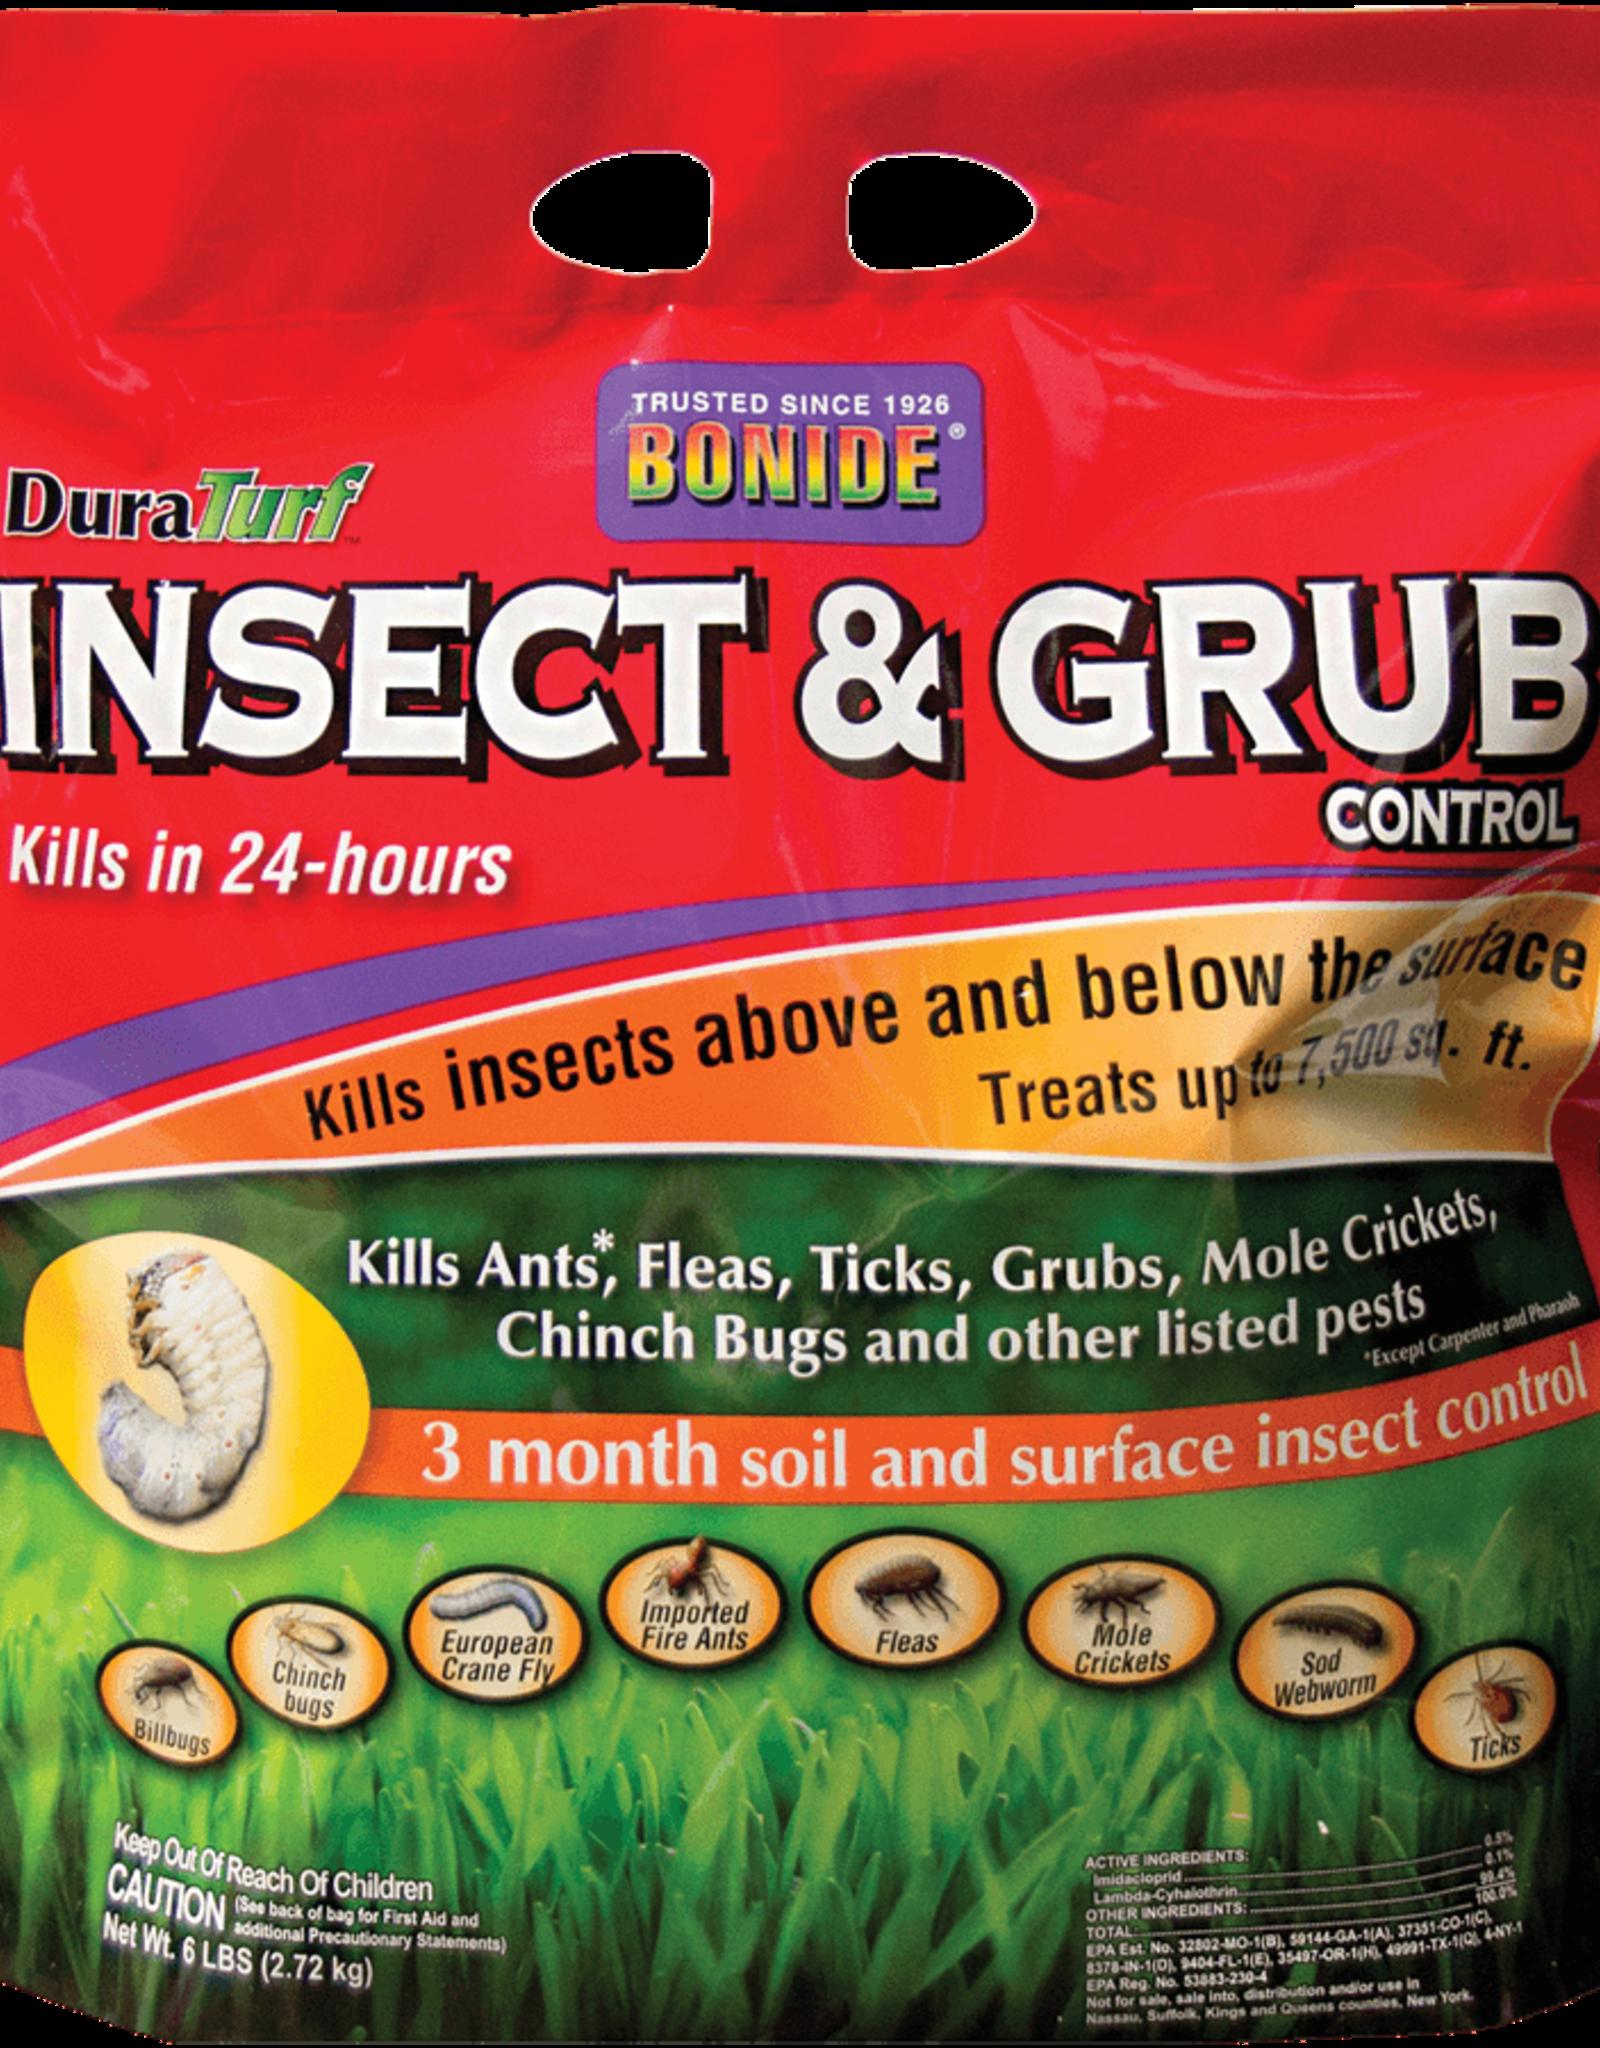 BONIDE PRODUCTS INC     P BONIDE INSECT & GRUB CONTROL DURATURF 6LBS